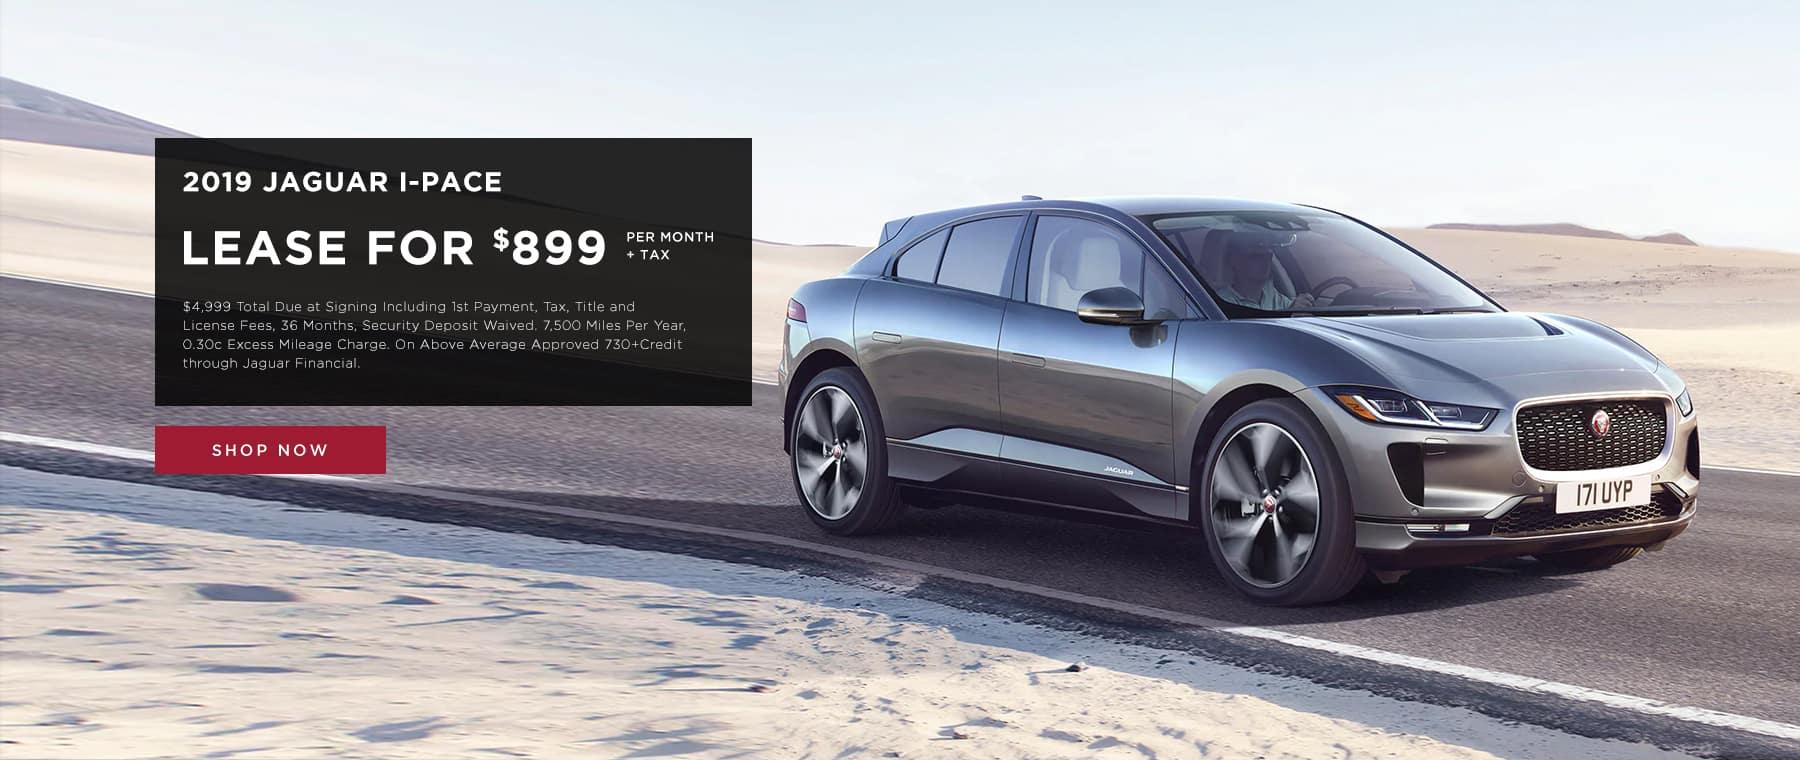 Toyota Santa Monica Service >> Hornburg Jaguar Santa Monica In Ca New Used Jaguar Dealer